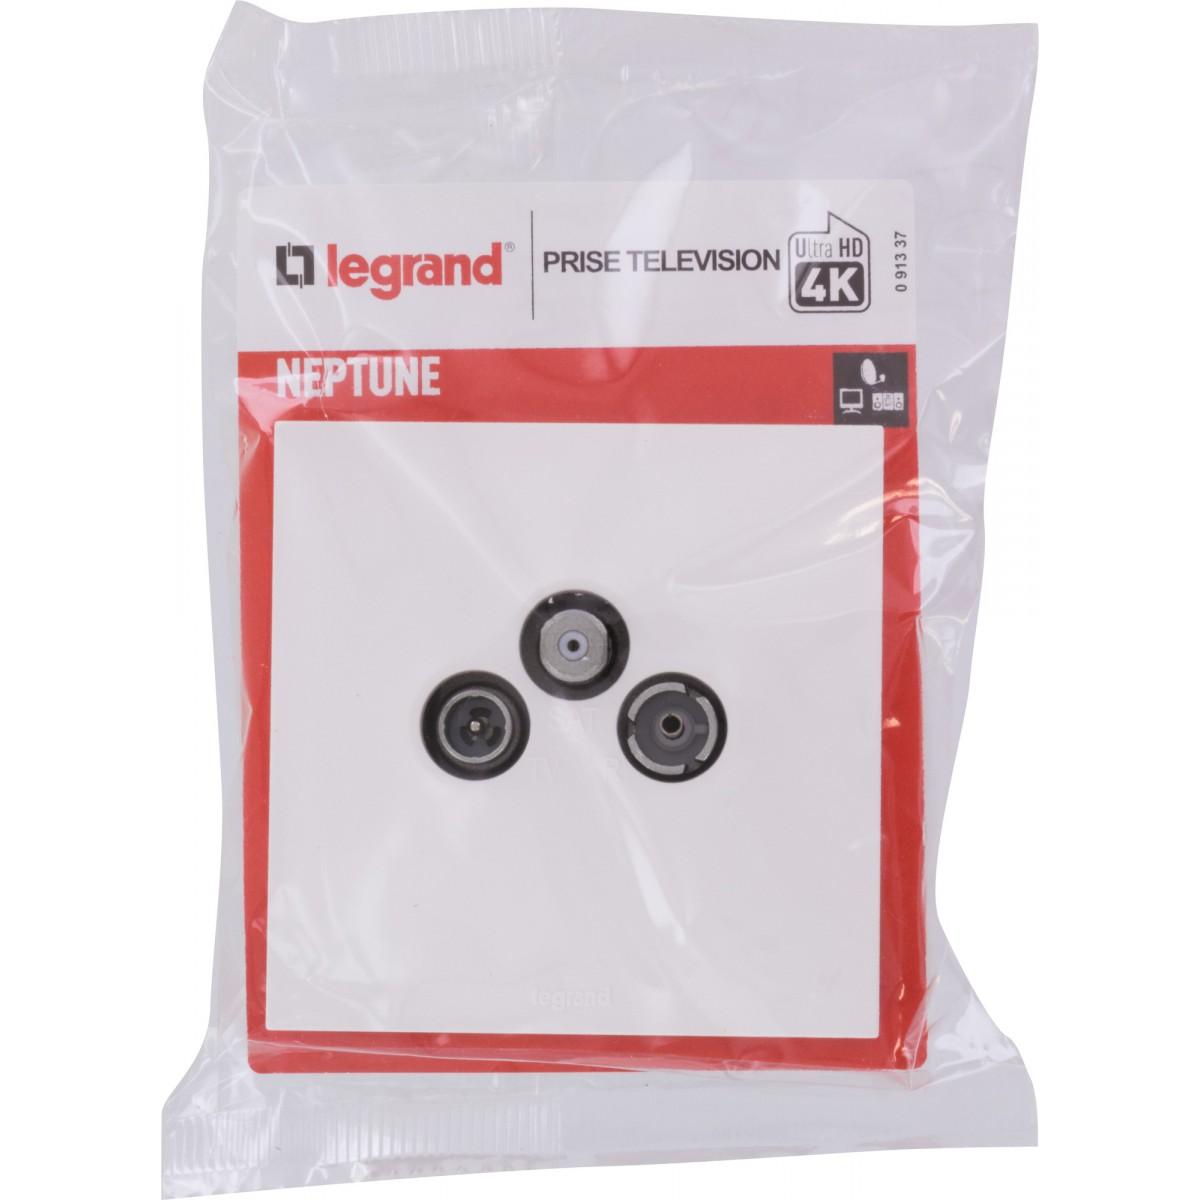 Prise TV-FM-SAT Legrand - Neptune - Blanc